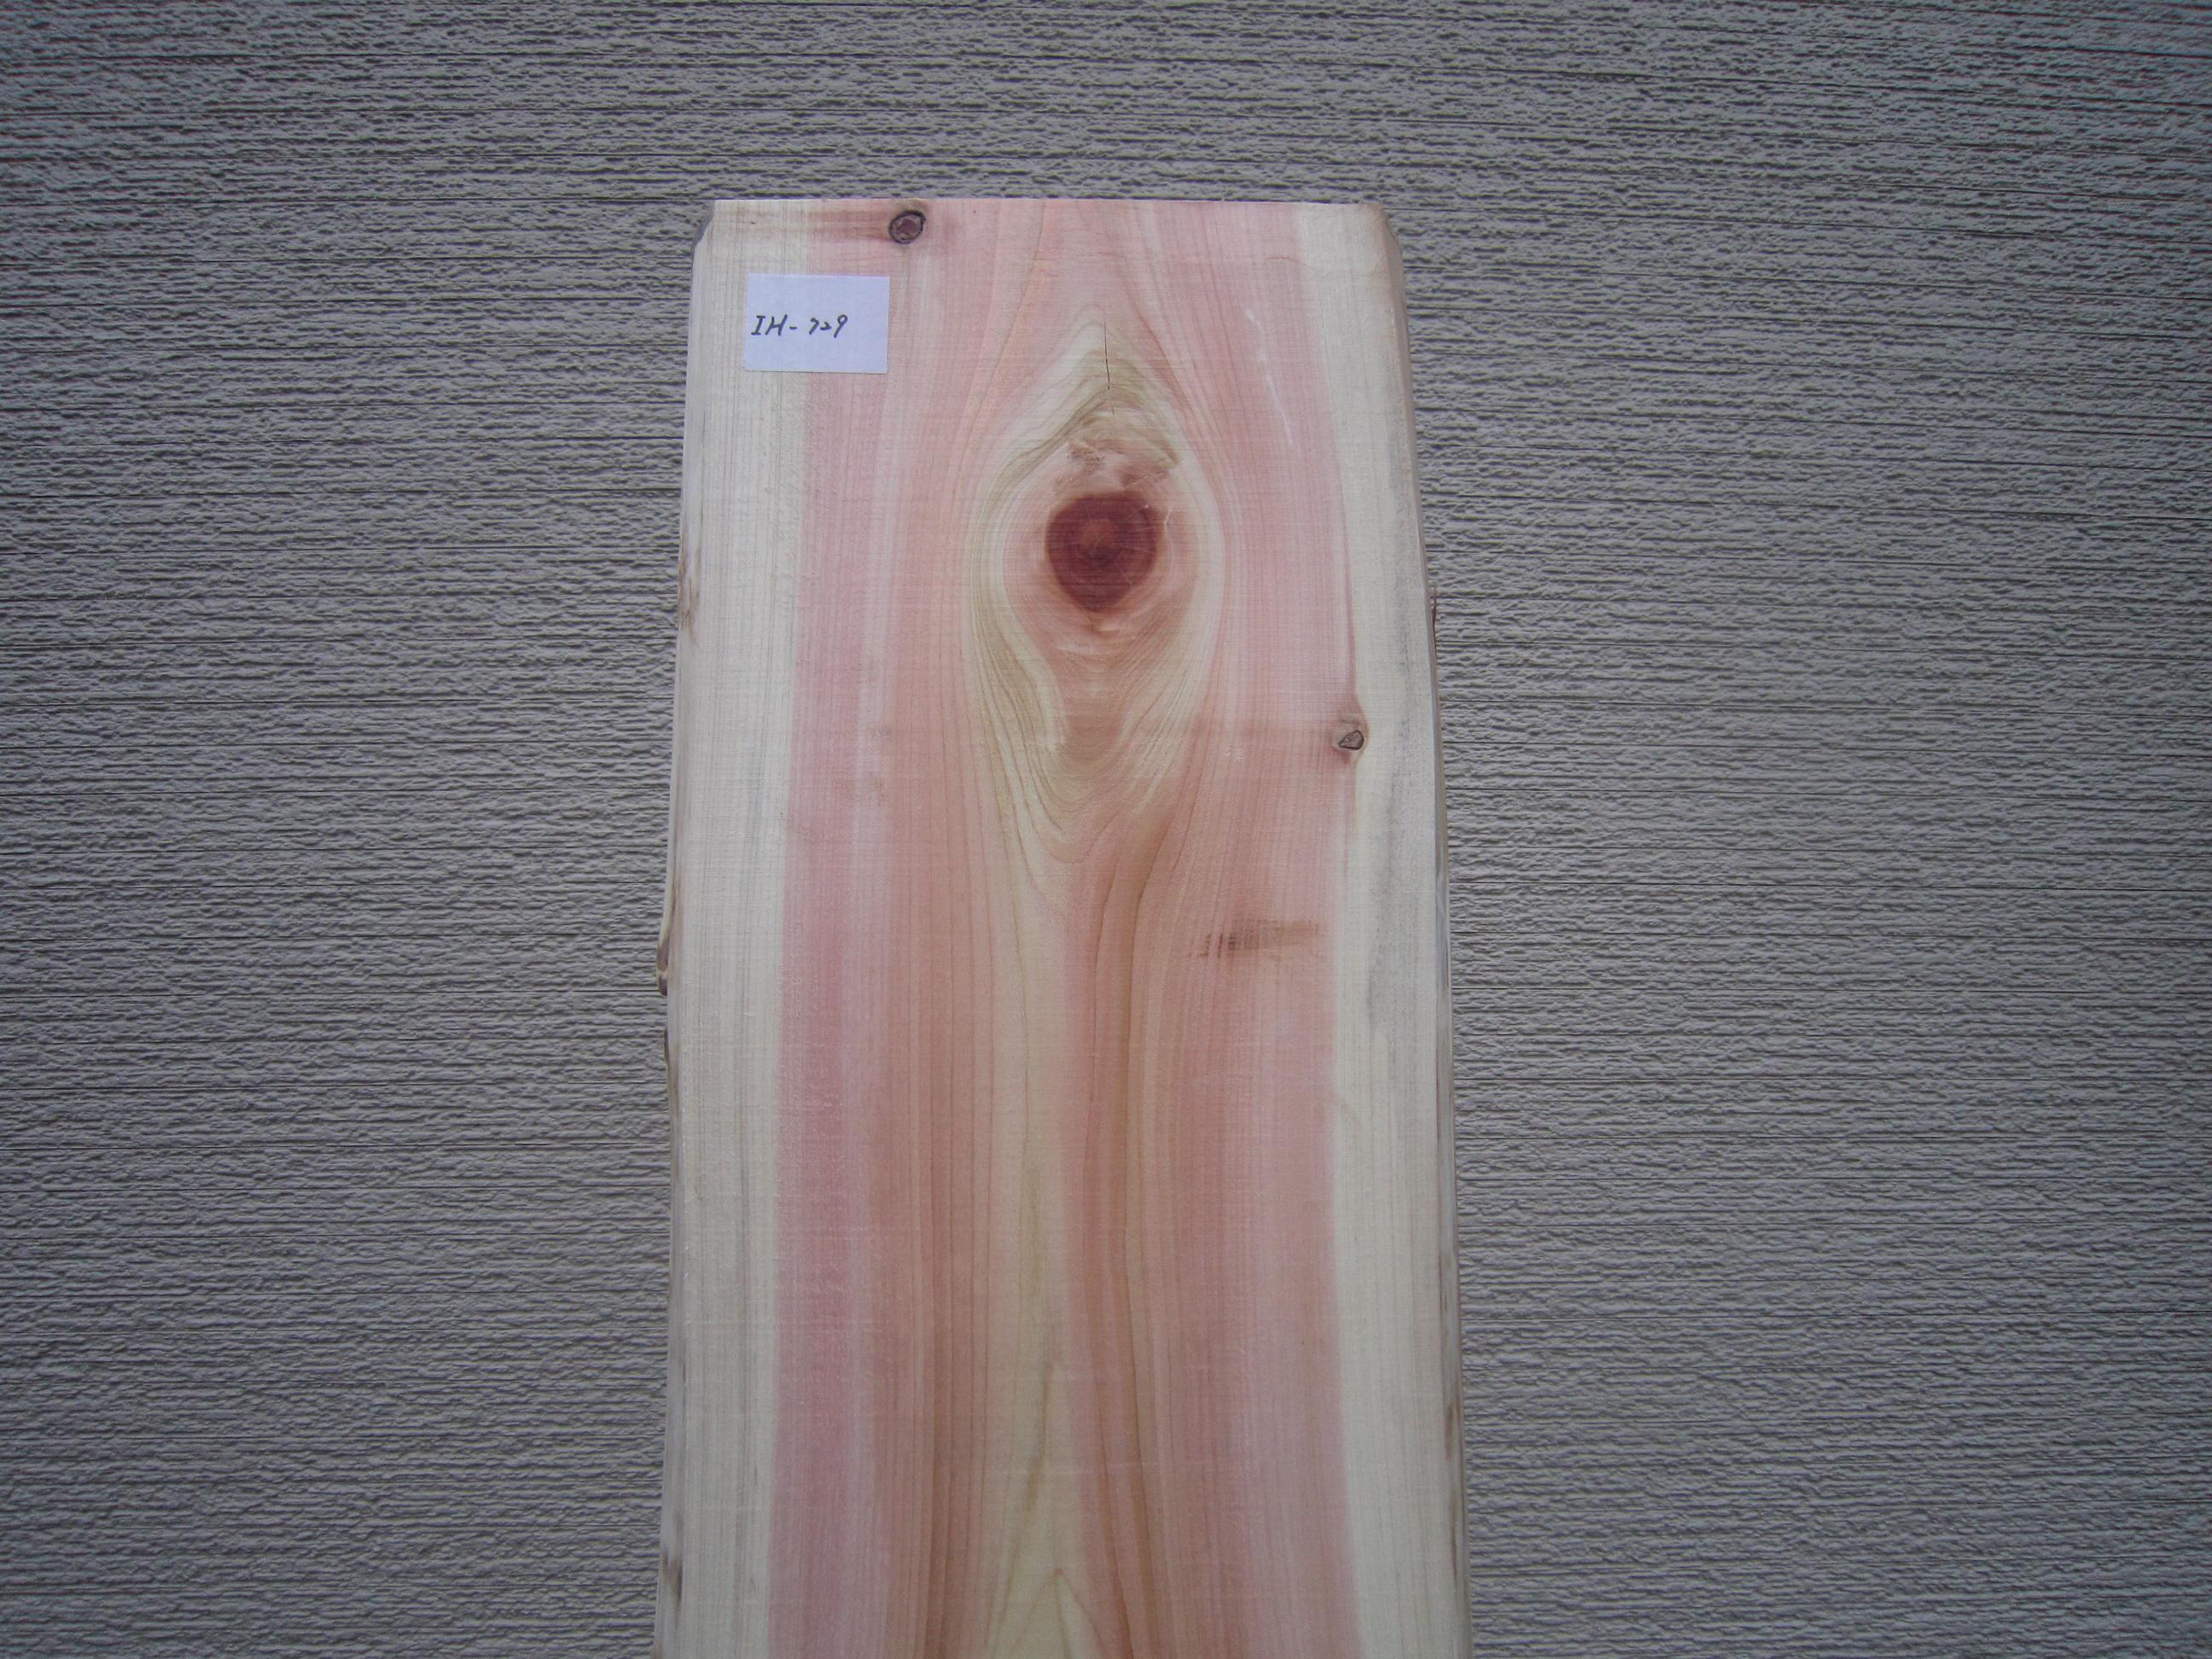 桧一枚板IH-729画像上部